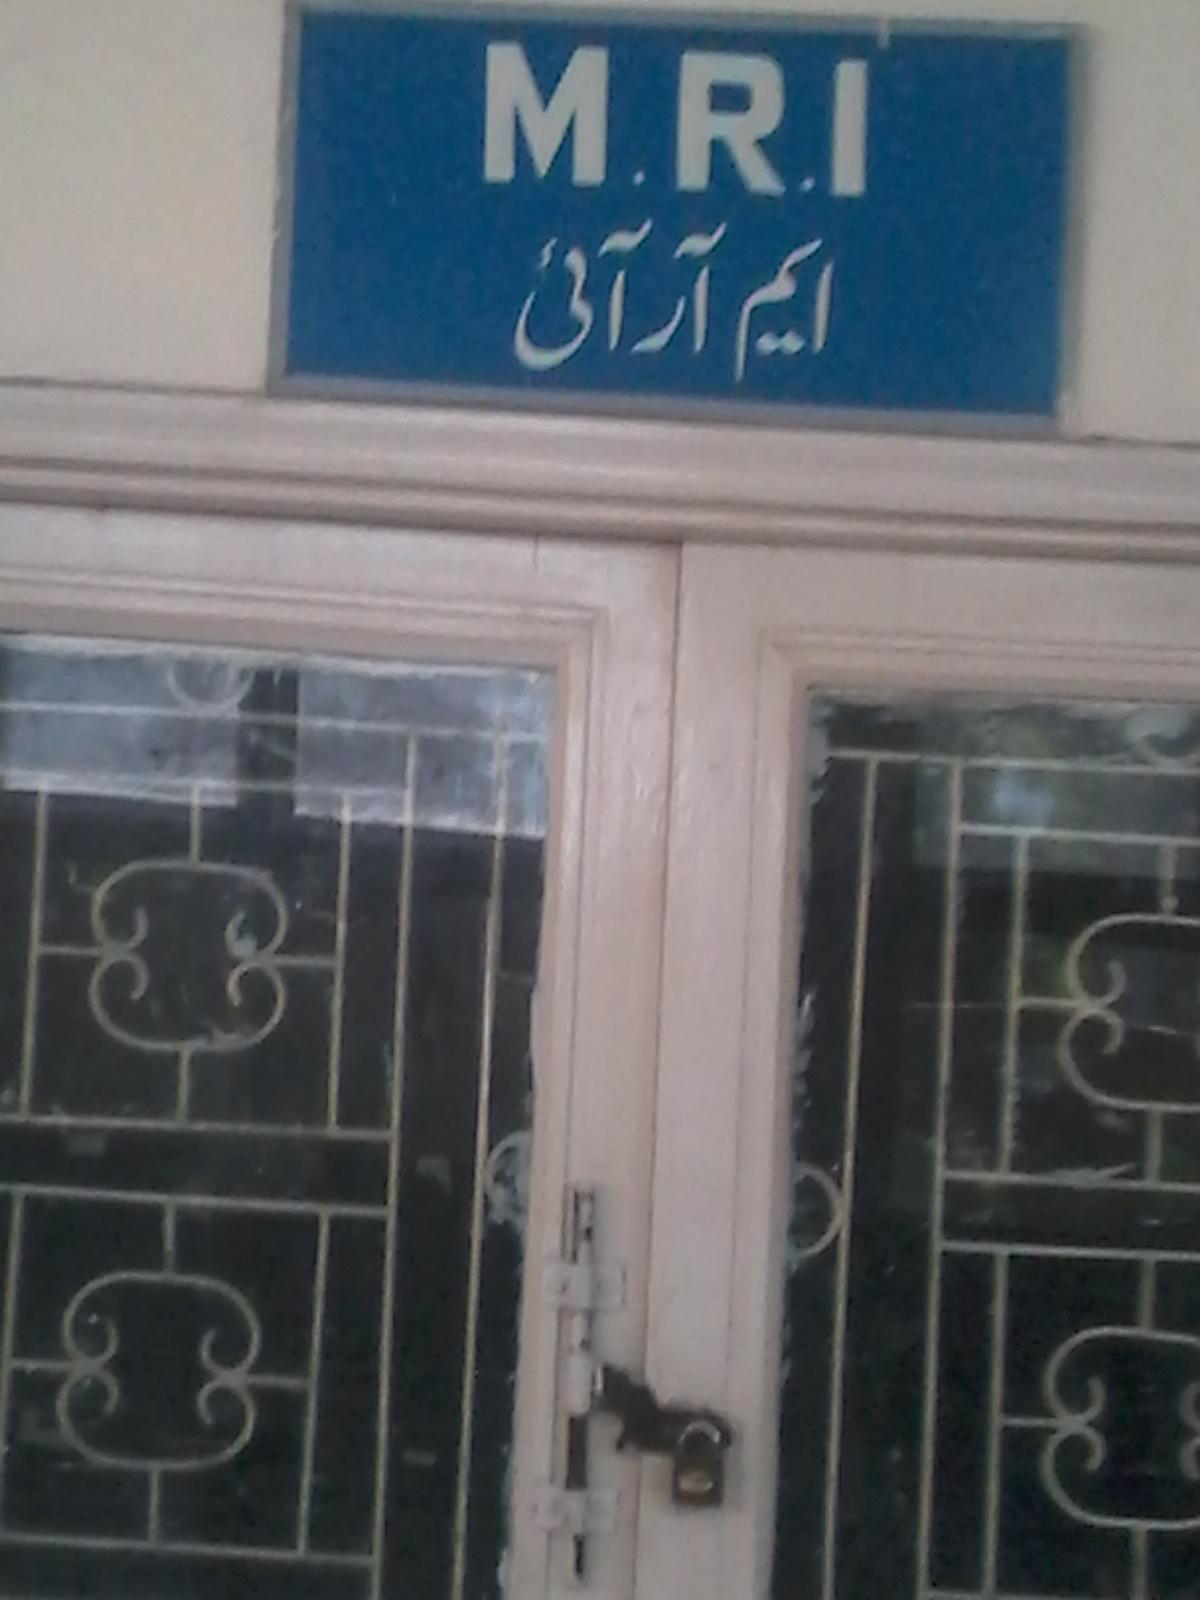 A view of the locked room of MRI machine at Hayatabad Medical Complex. - Photo by Sajjad Yusufzai